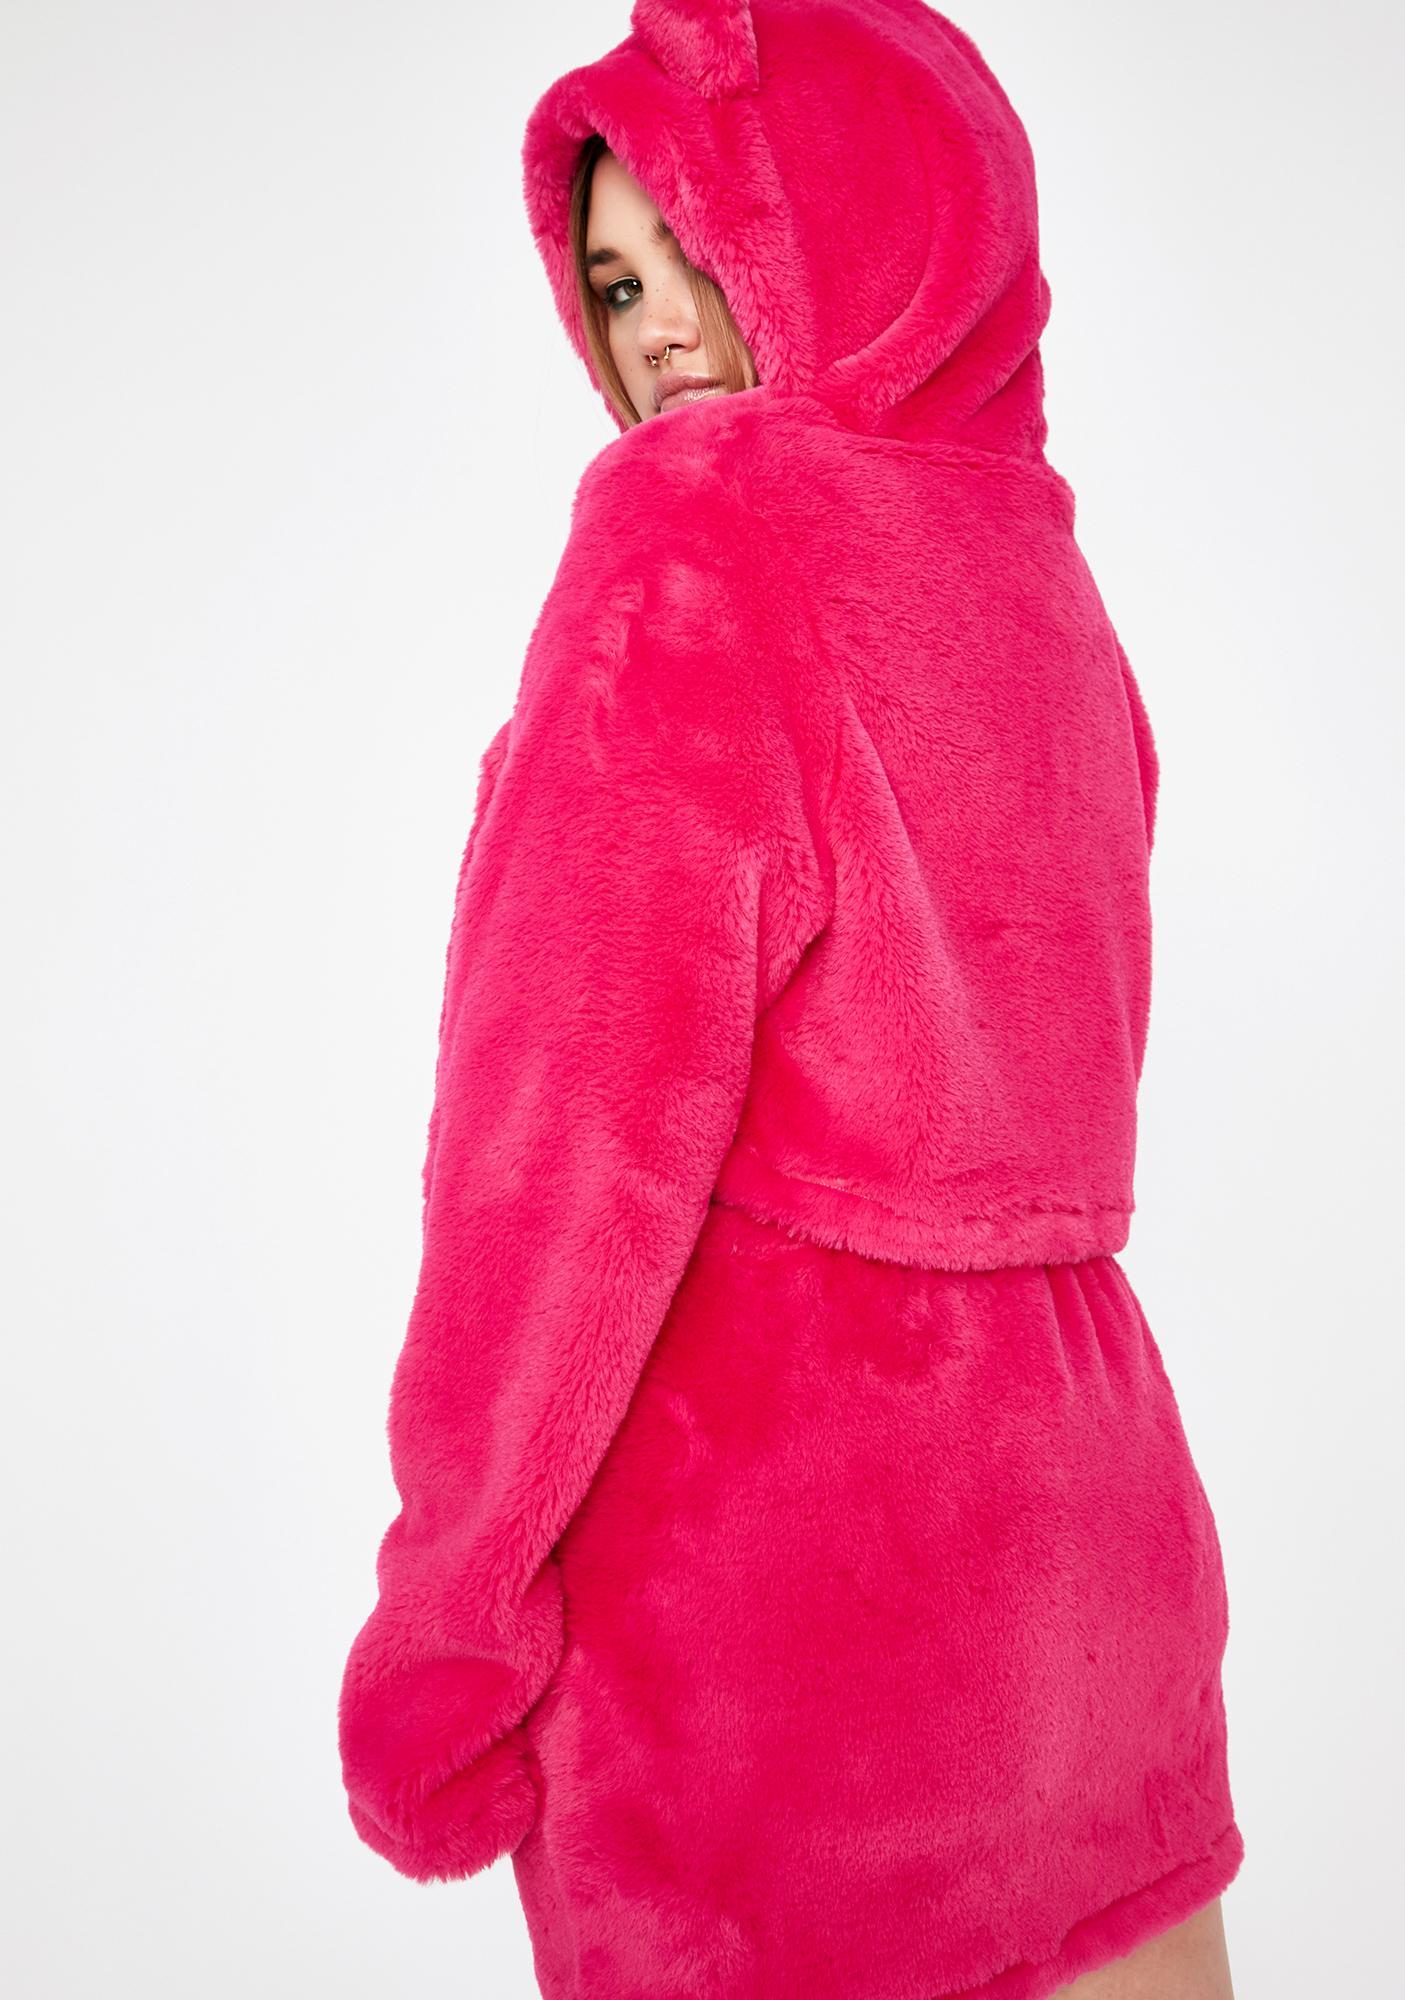 Club Exx Real Furreak Animali Cropped Hoodie